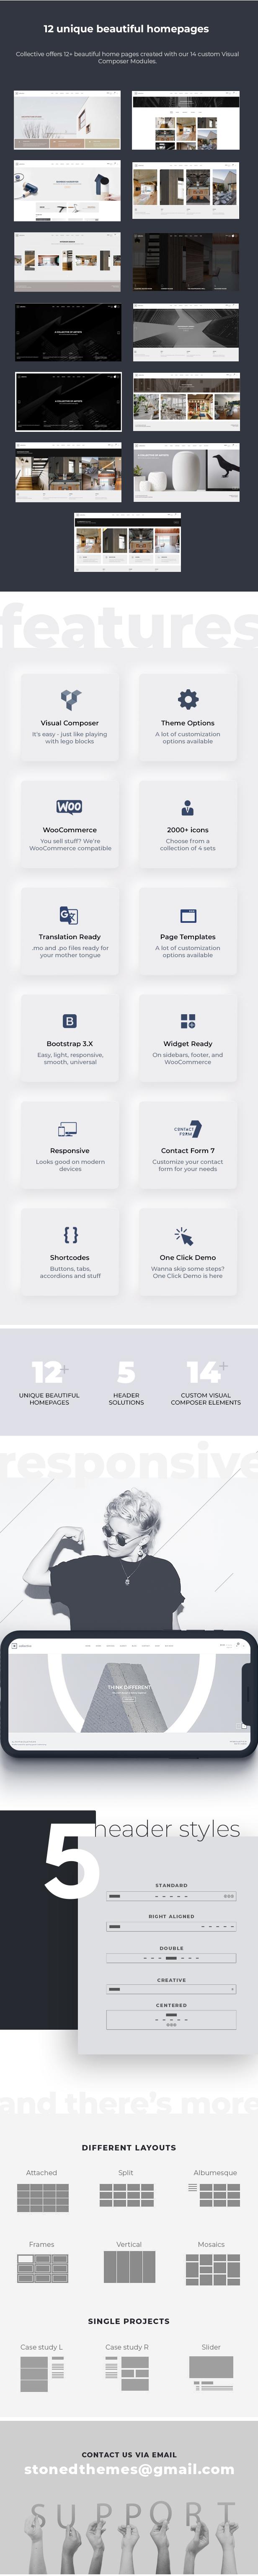 Kollektiv - Minimales WordPress-Theme - 2